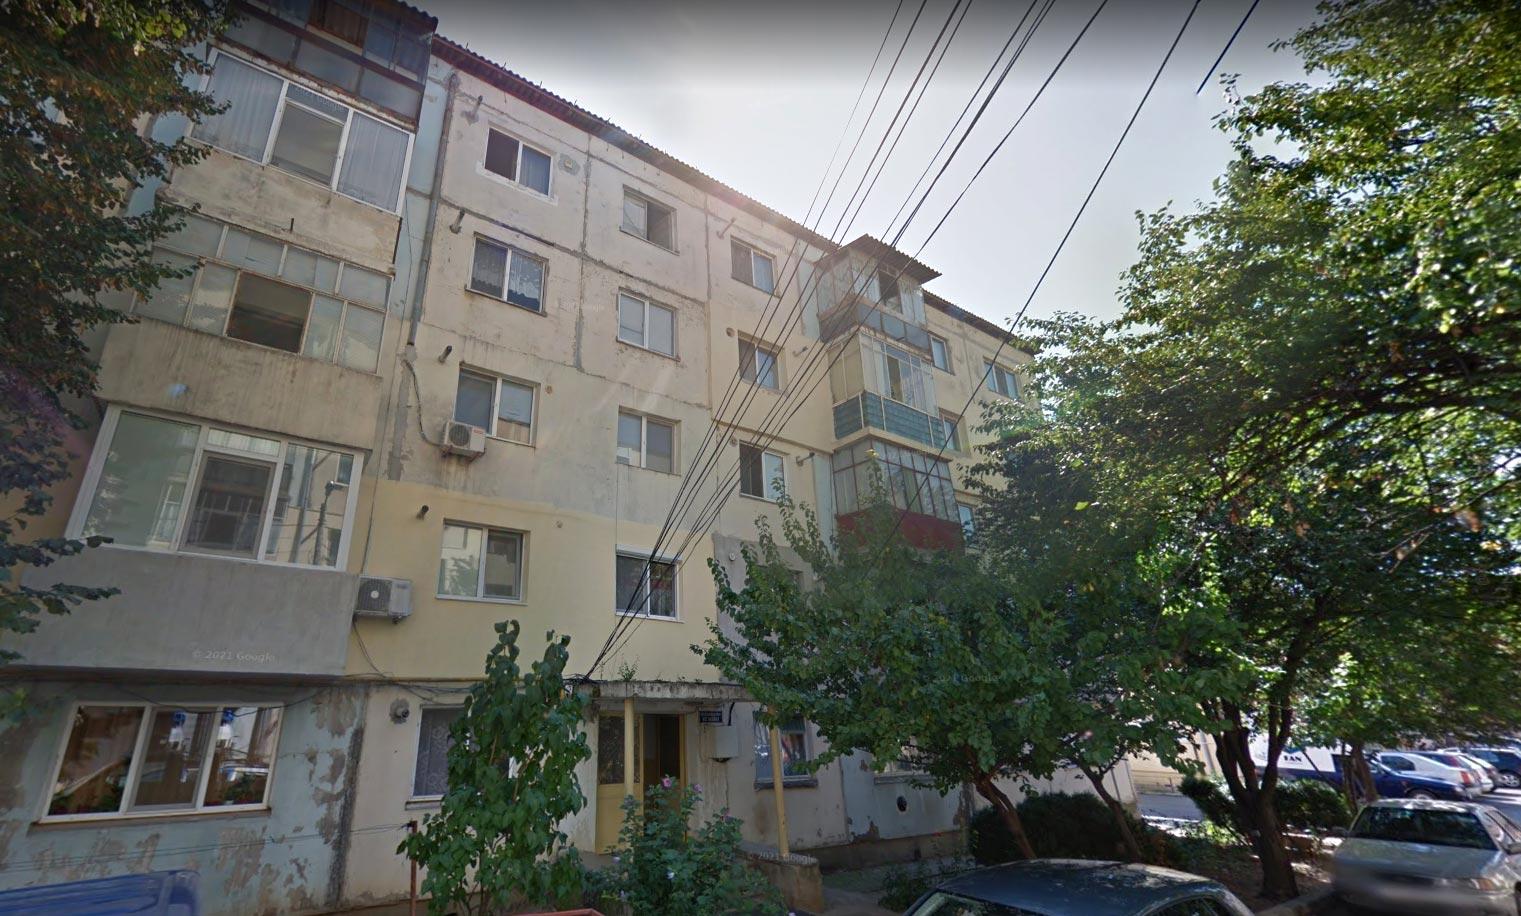 Apartament 3 camere, 81,04mp, Urziceni, jud. Ialomita